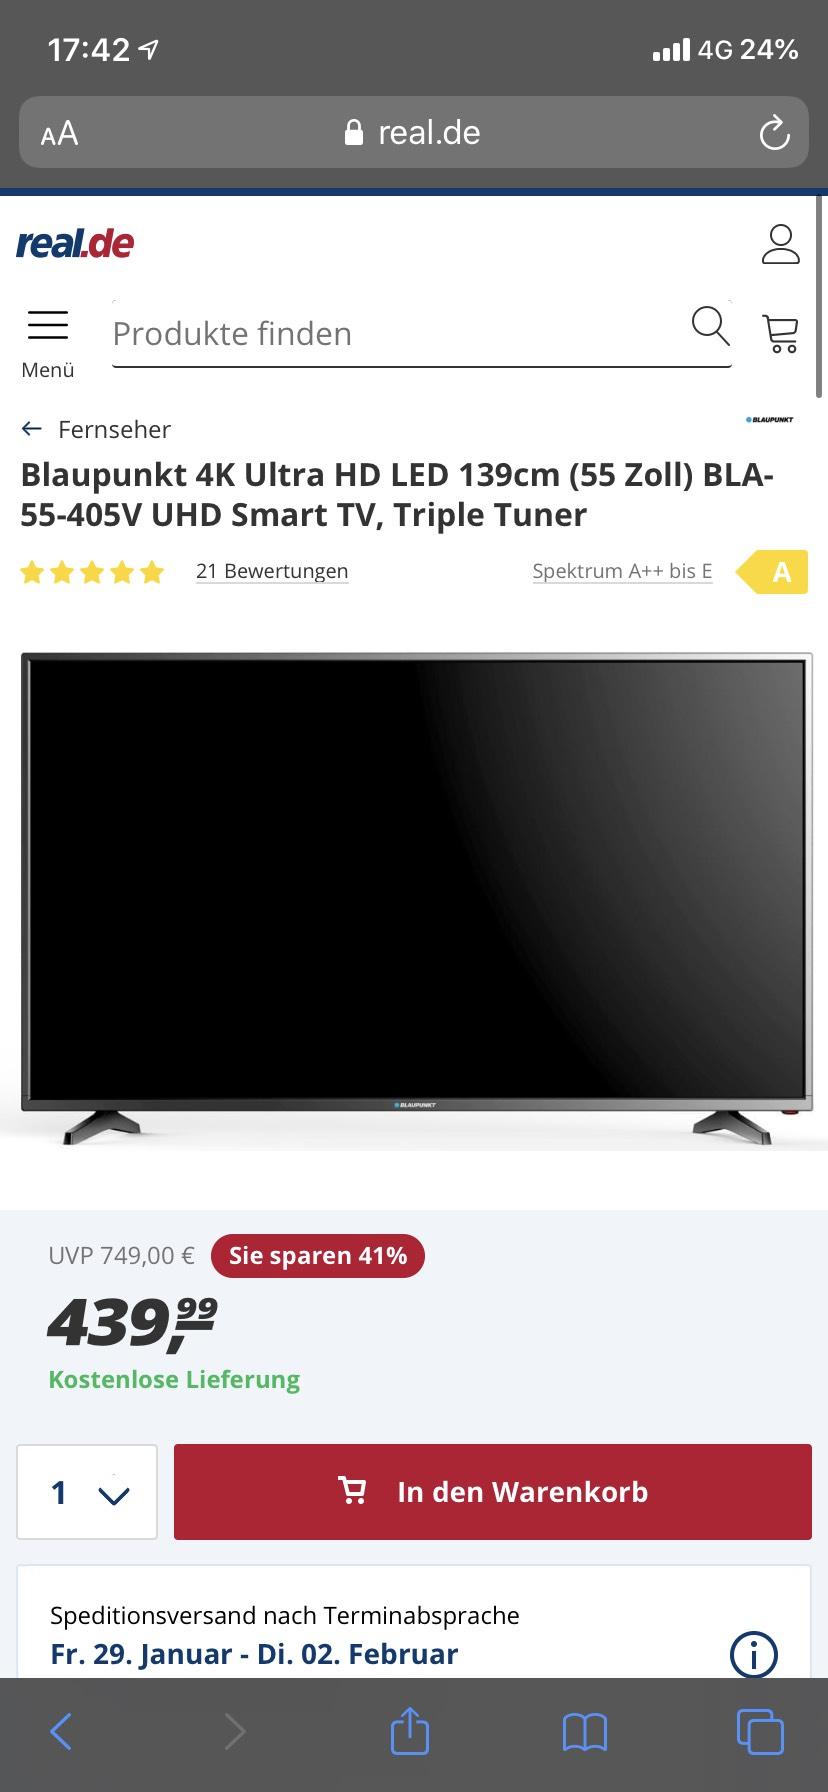 Blaupunkt 4K Ultra HD LED 139cm (55 Zoll) BLA-55-405V UHD Smart TV, Triple Tuner